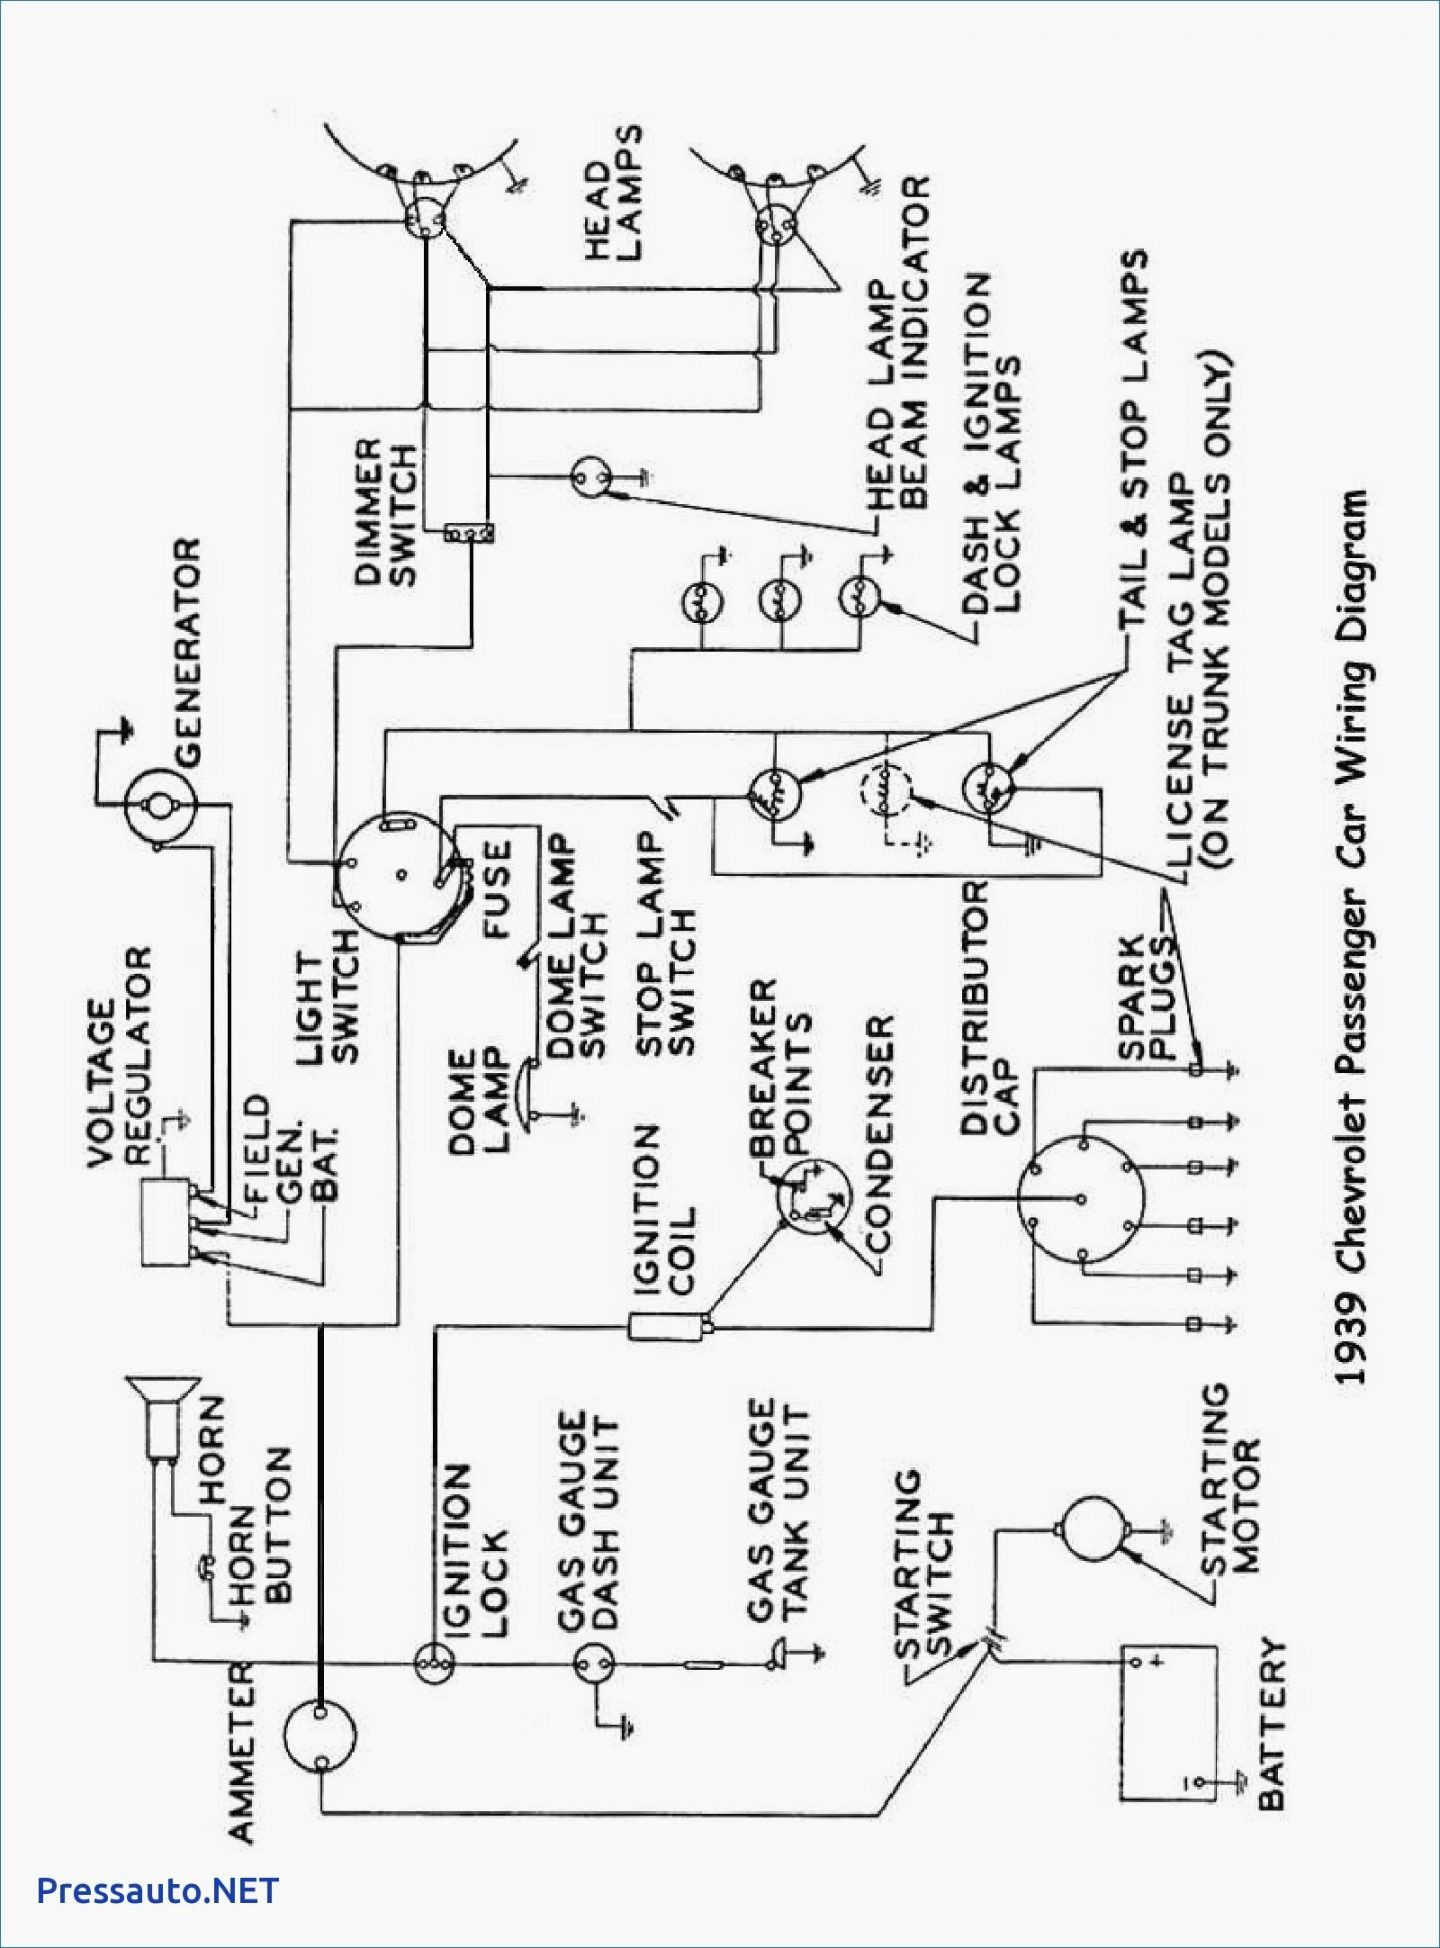 wiring diagram welding machine inspirationa best of pdf circuitwiring diagram welding machine inspirationa best of pdf [ 1440 x 1948 Pixel ]